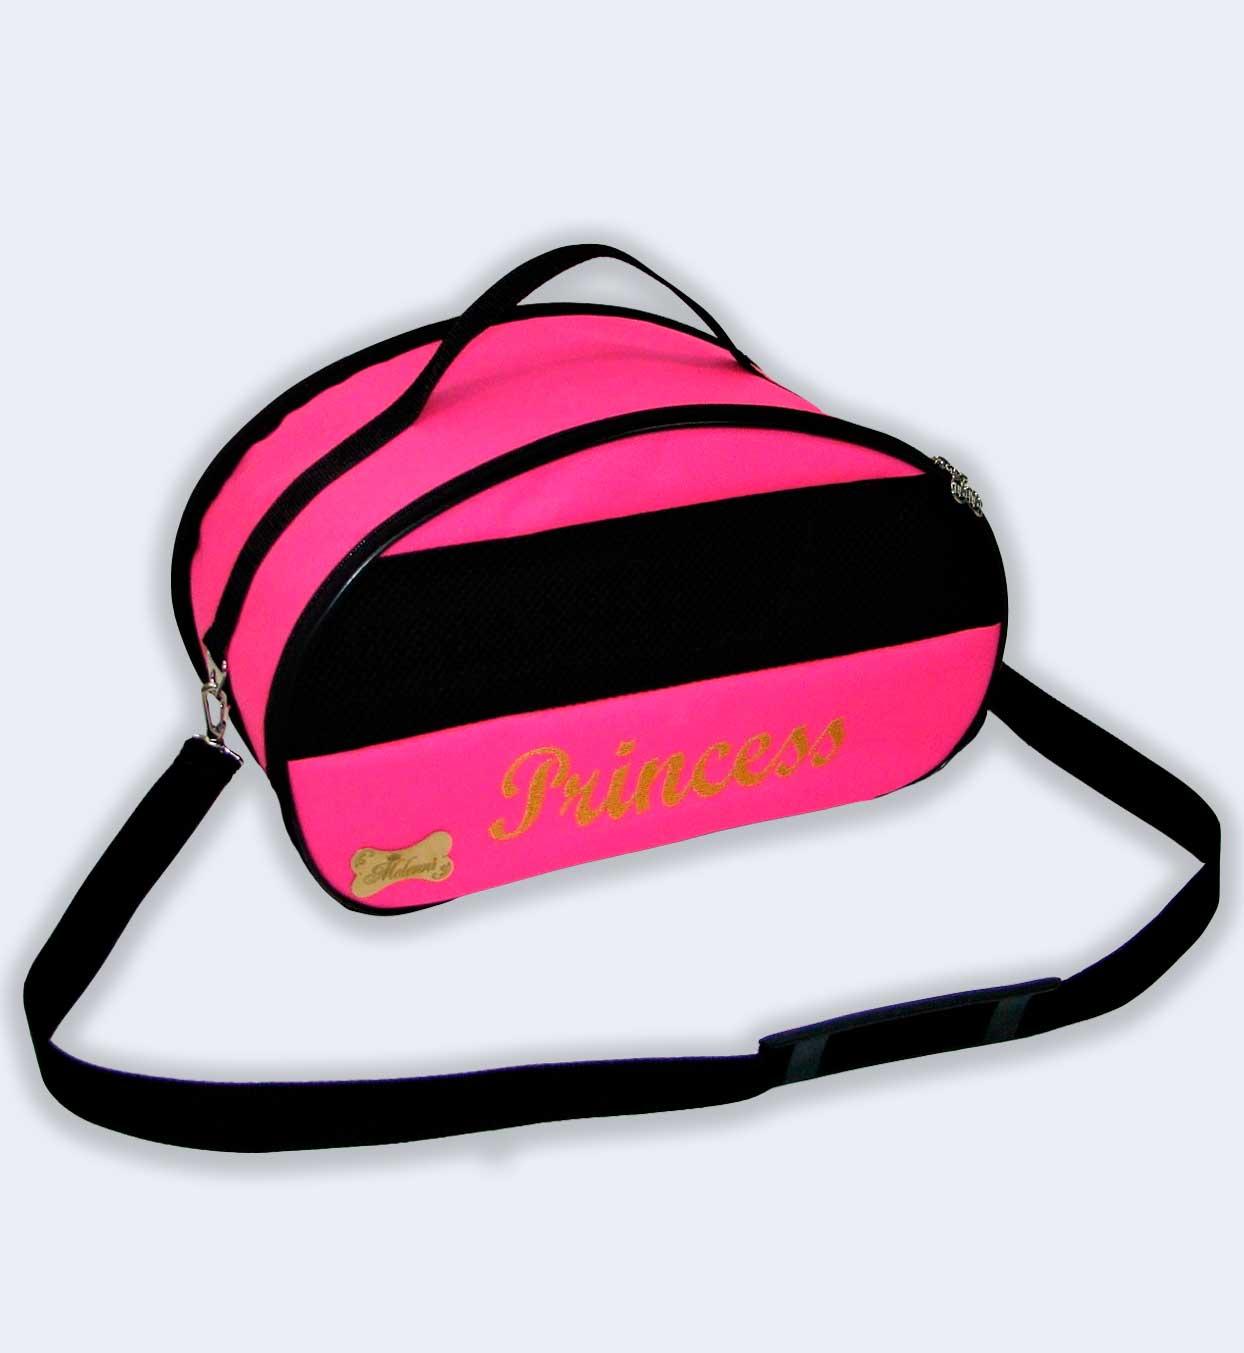 Переноска закрытая Melenni Стандарт Princess XS розовая переноска для кошек и собак up флоренция розовая 46х30х32см